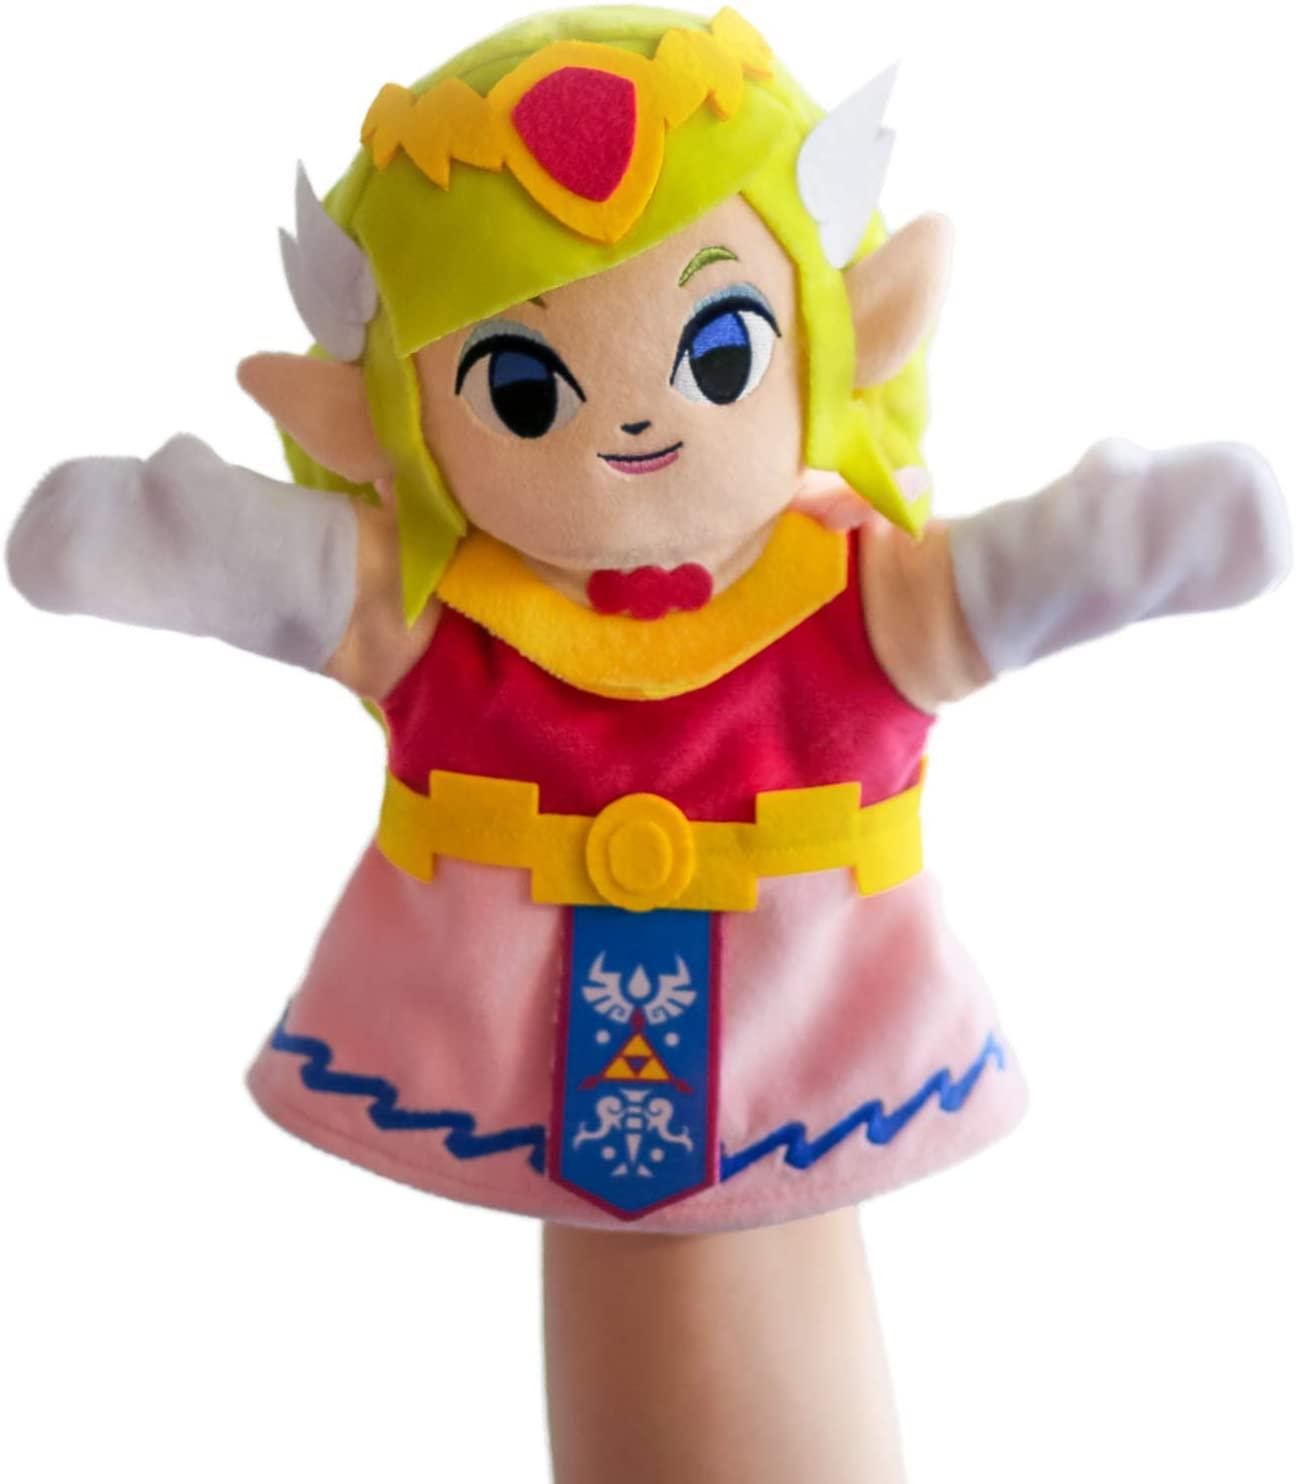 Hashtag Collectibles Princess Zelda Puppet (The Legend of Zelda)